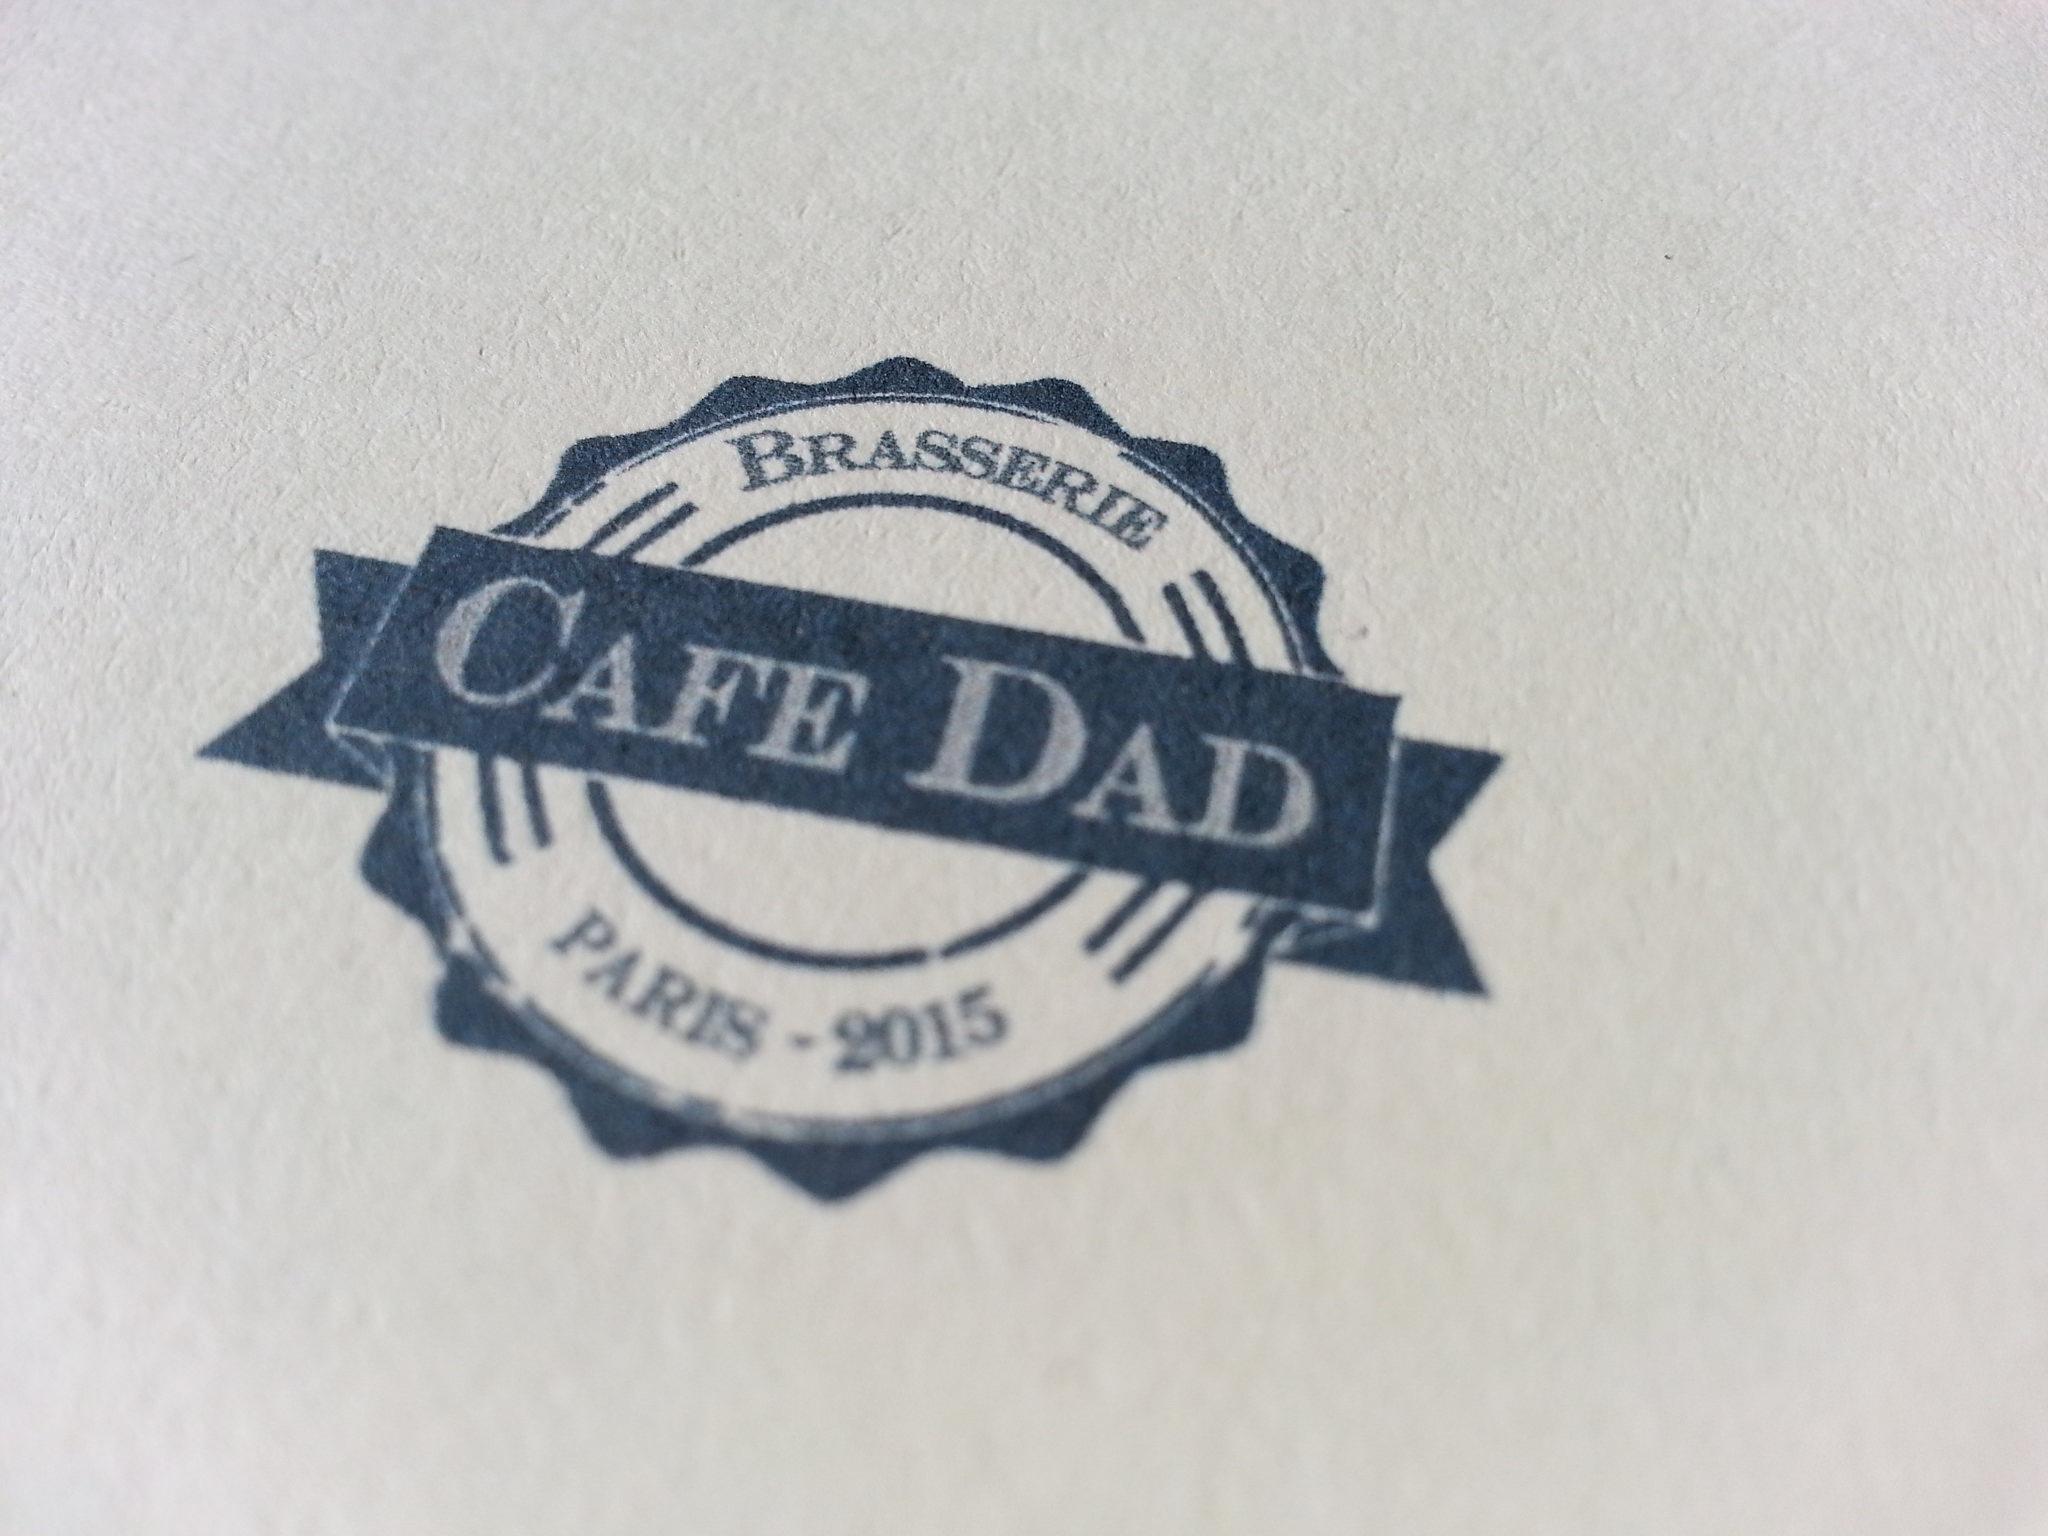 Cafe Dad Paris